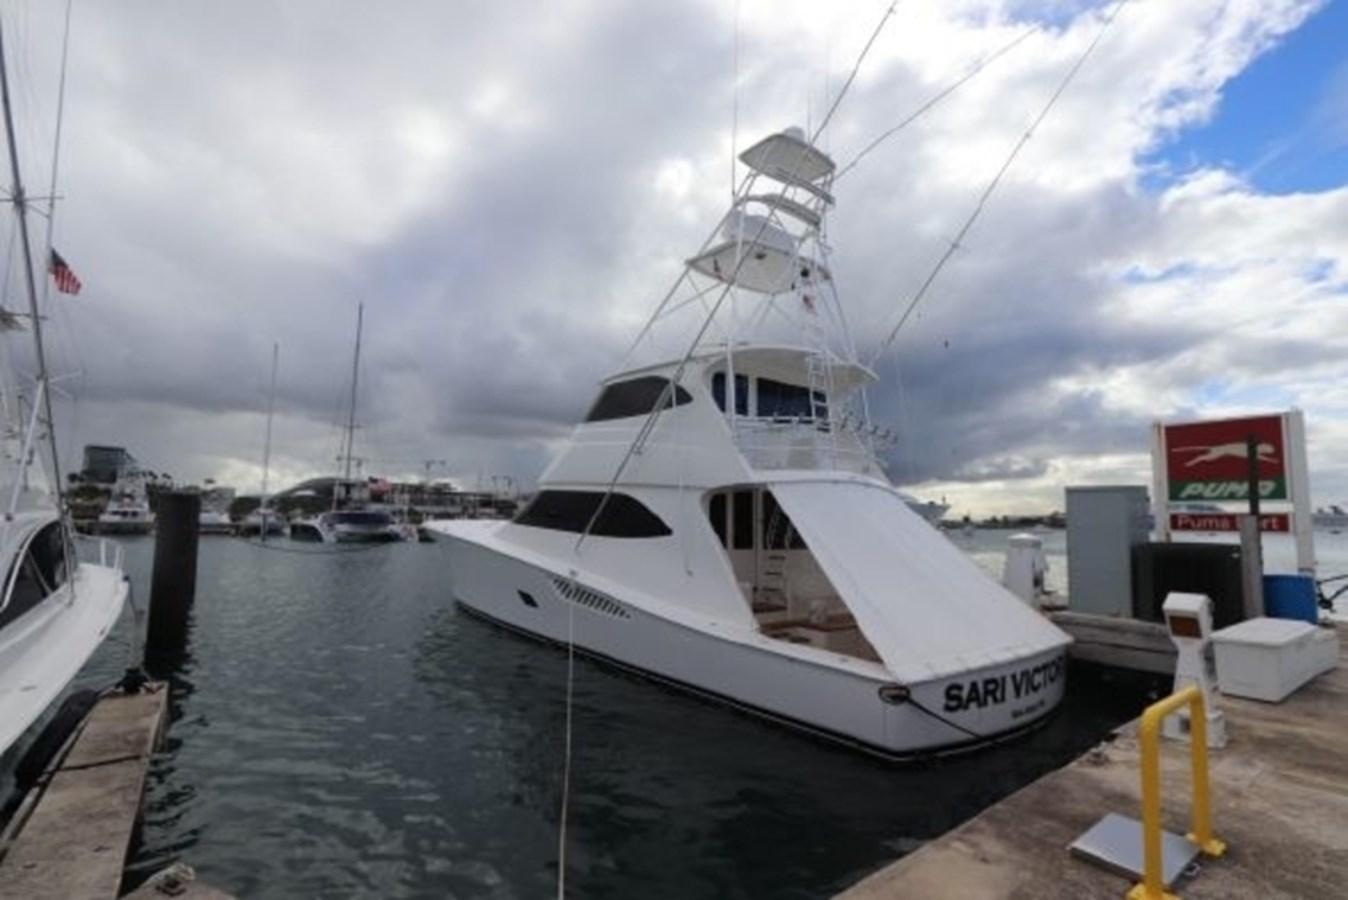 Webp.net-resizeimage 2011 VIKING  Motor Yacht 2897376